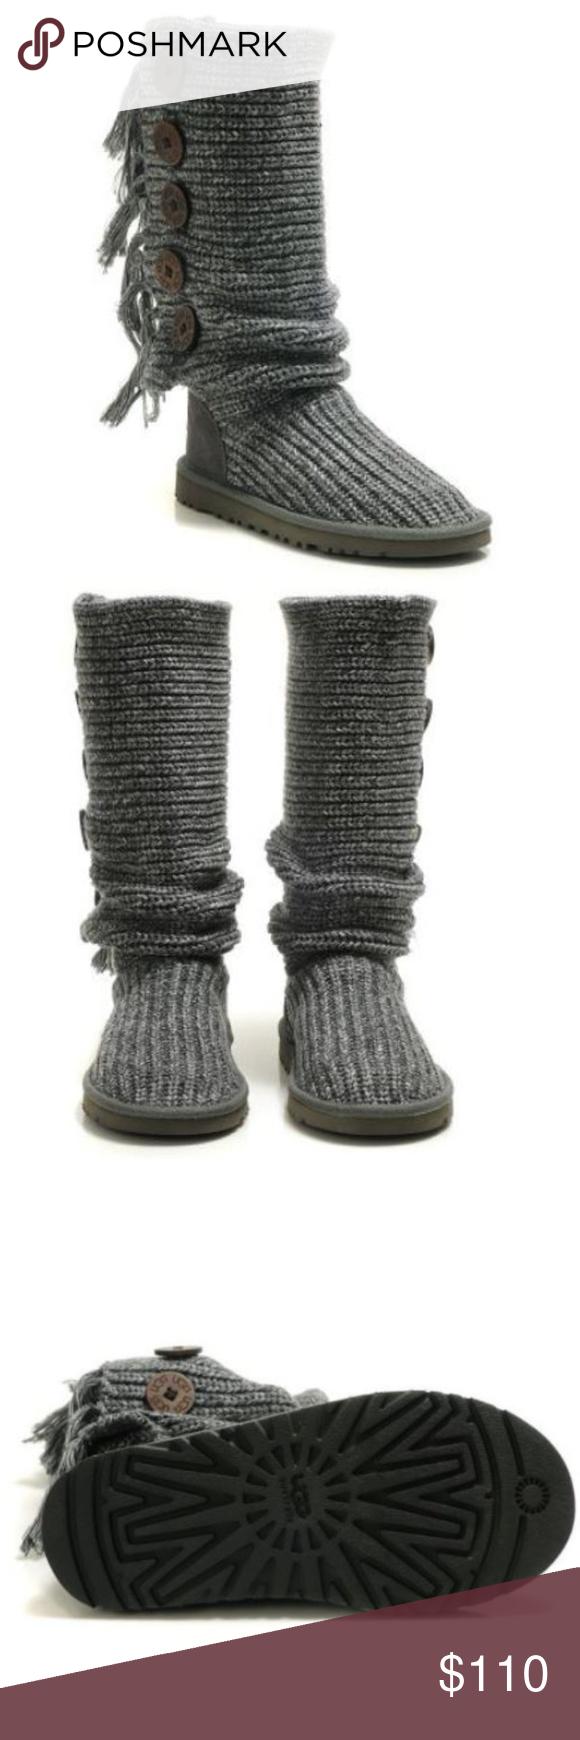 Ugg Australia Fringe Cardy Boots Like New Favorite Rib